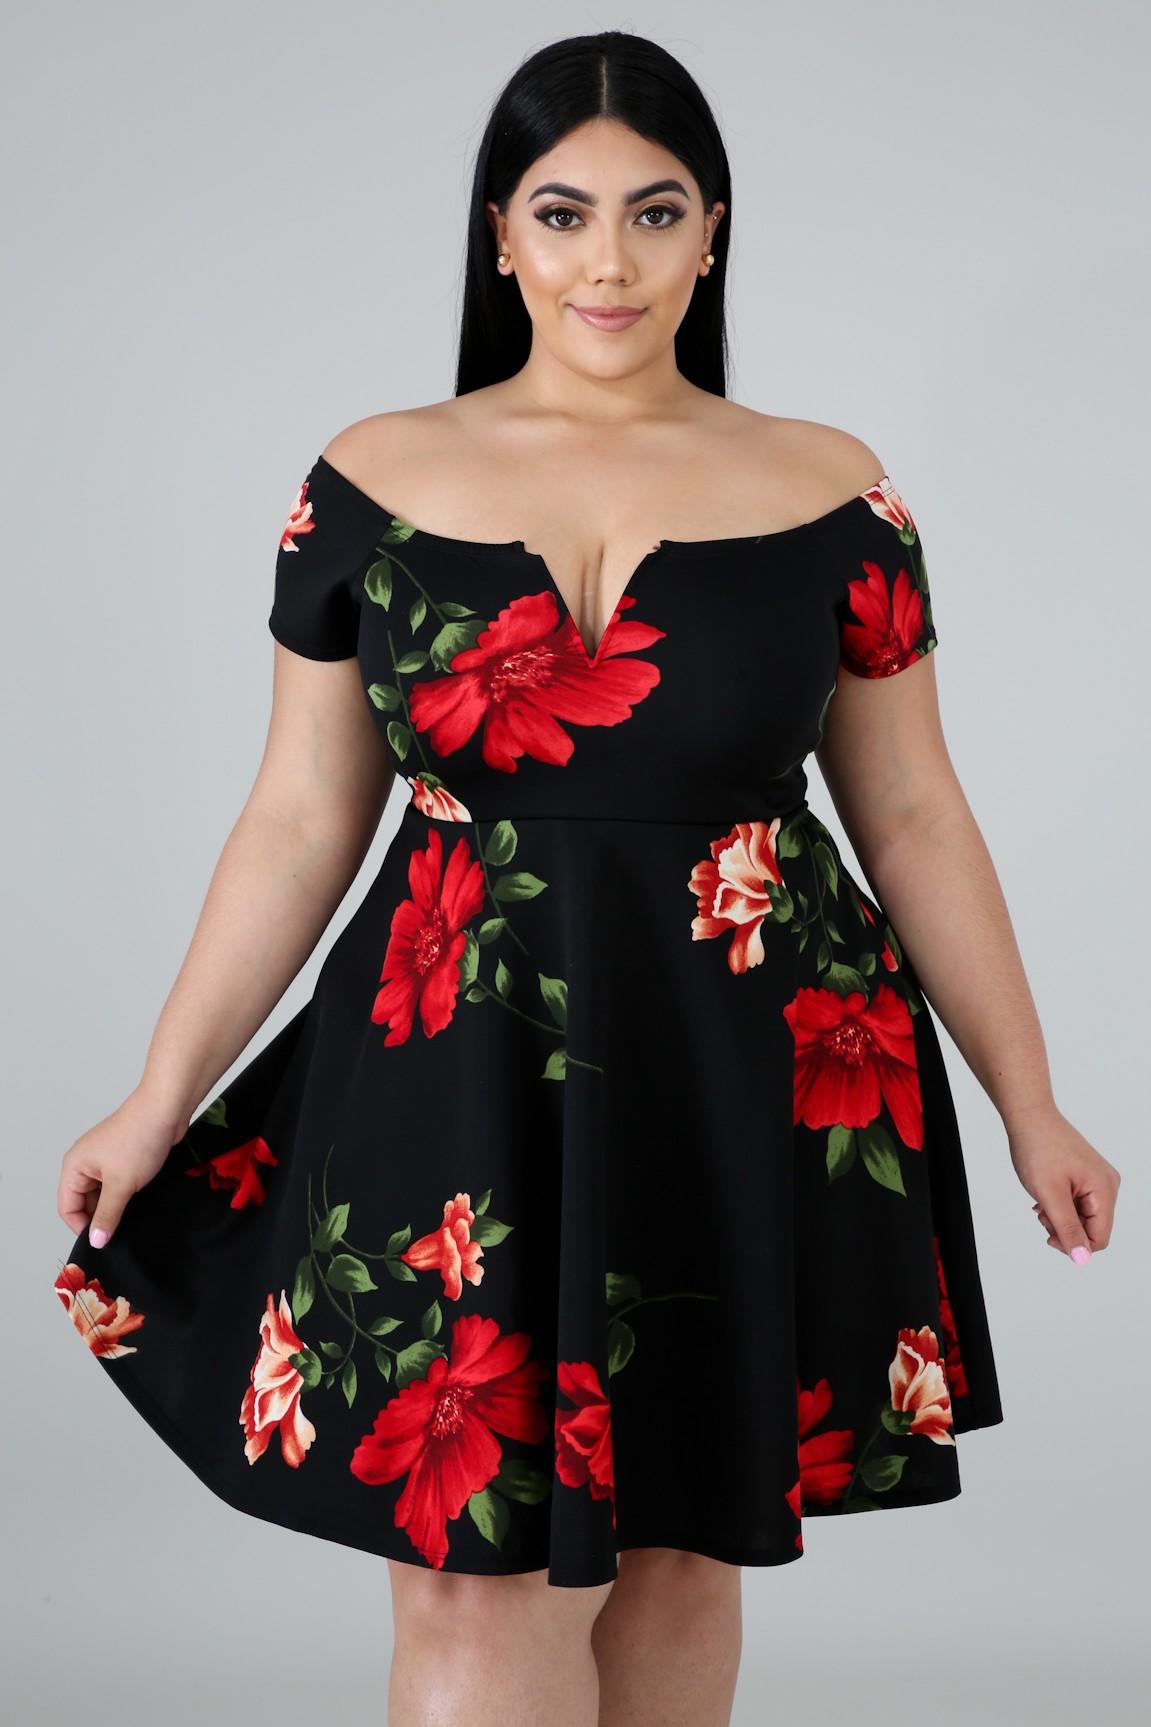 Floral Fun Flare Dress